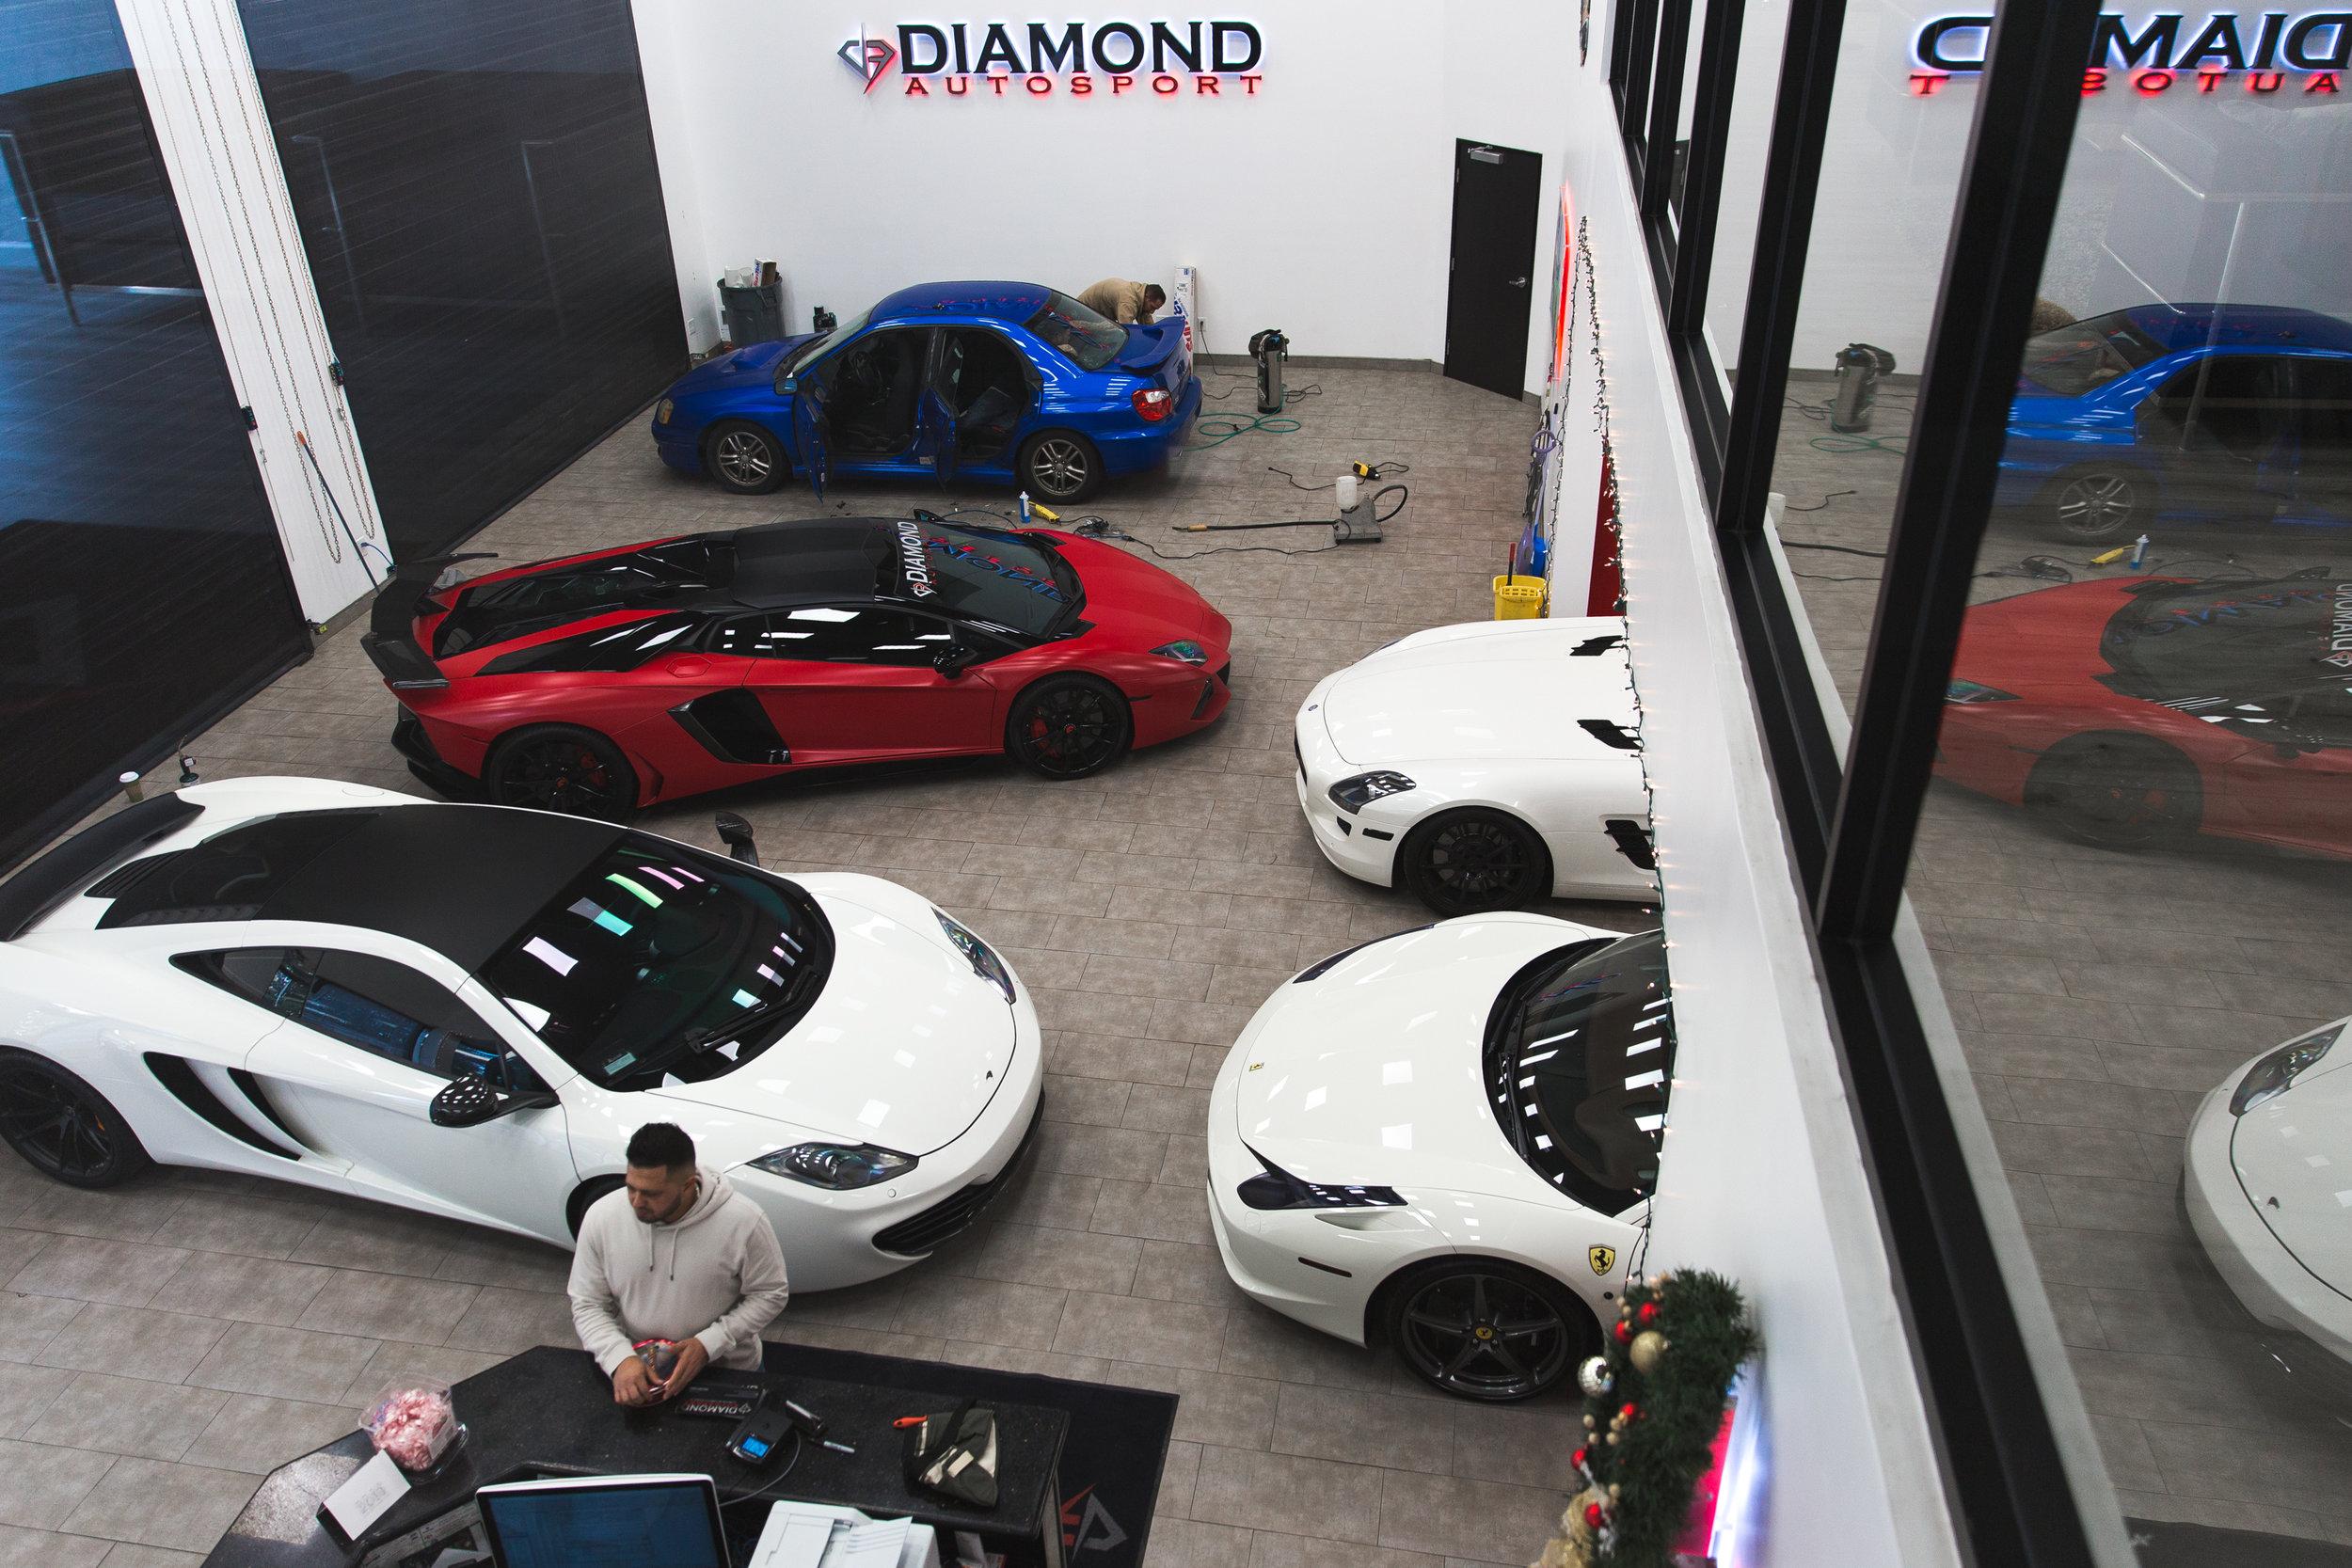 Stay_Driven_Sacramento_Diamond_Autosport-23.jpg